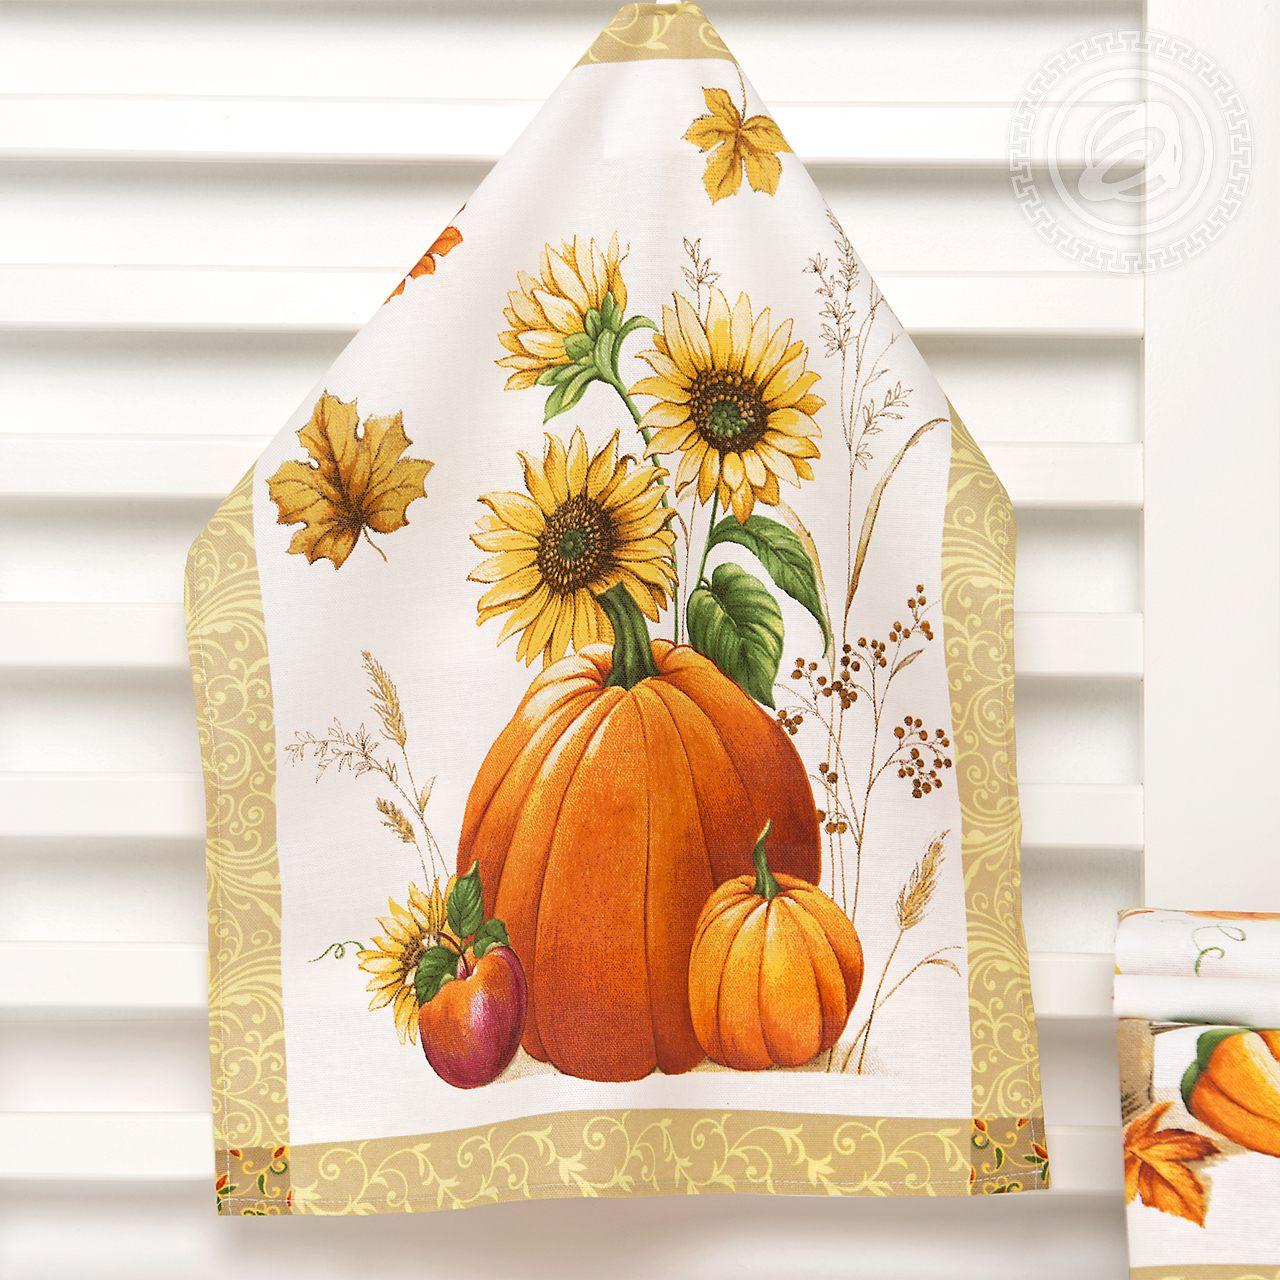 Кухонное полотенце Грандсток 16388730 от Grandstock